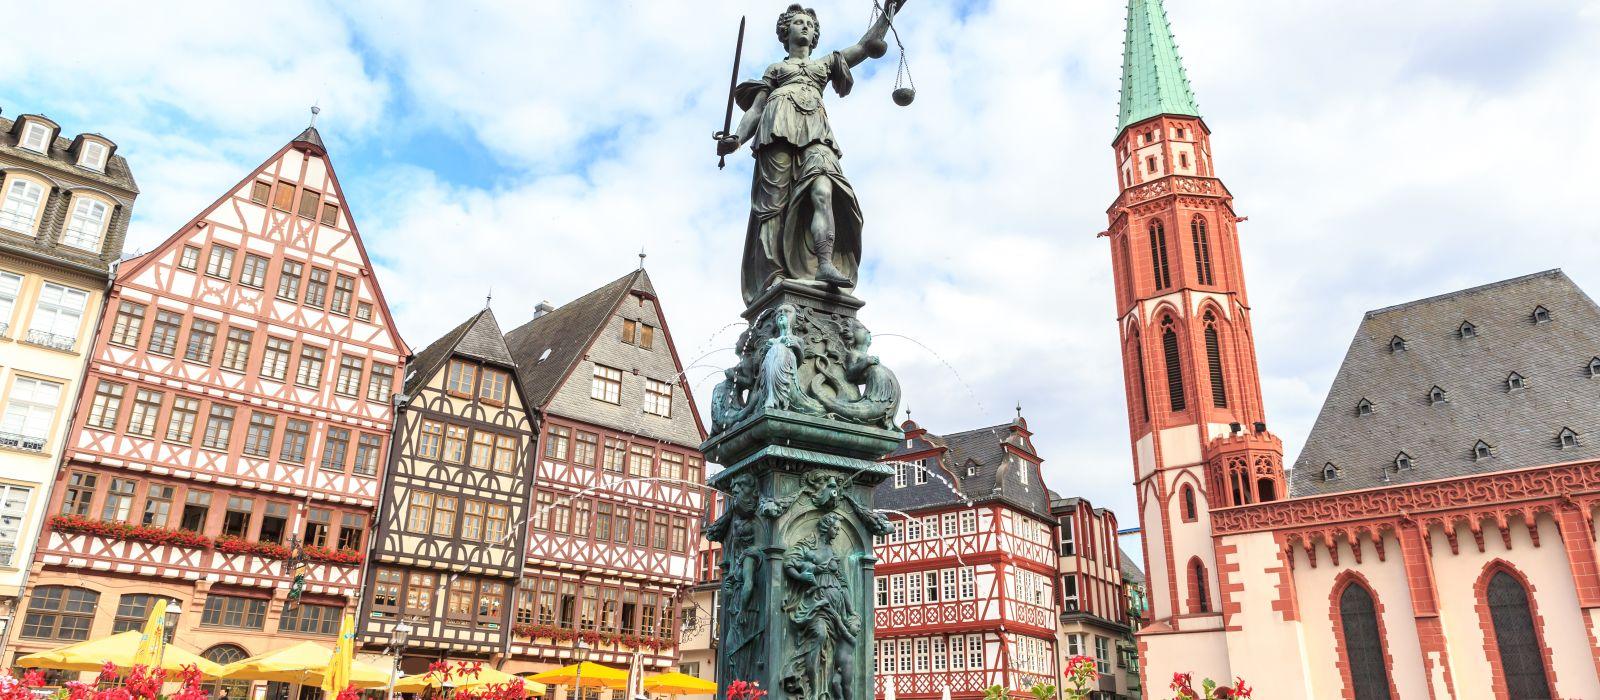 Destination Frankfurt Germany